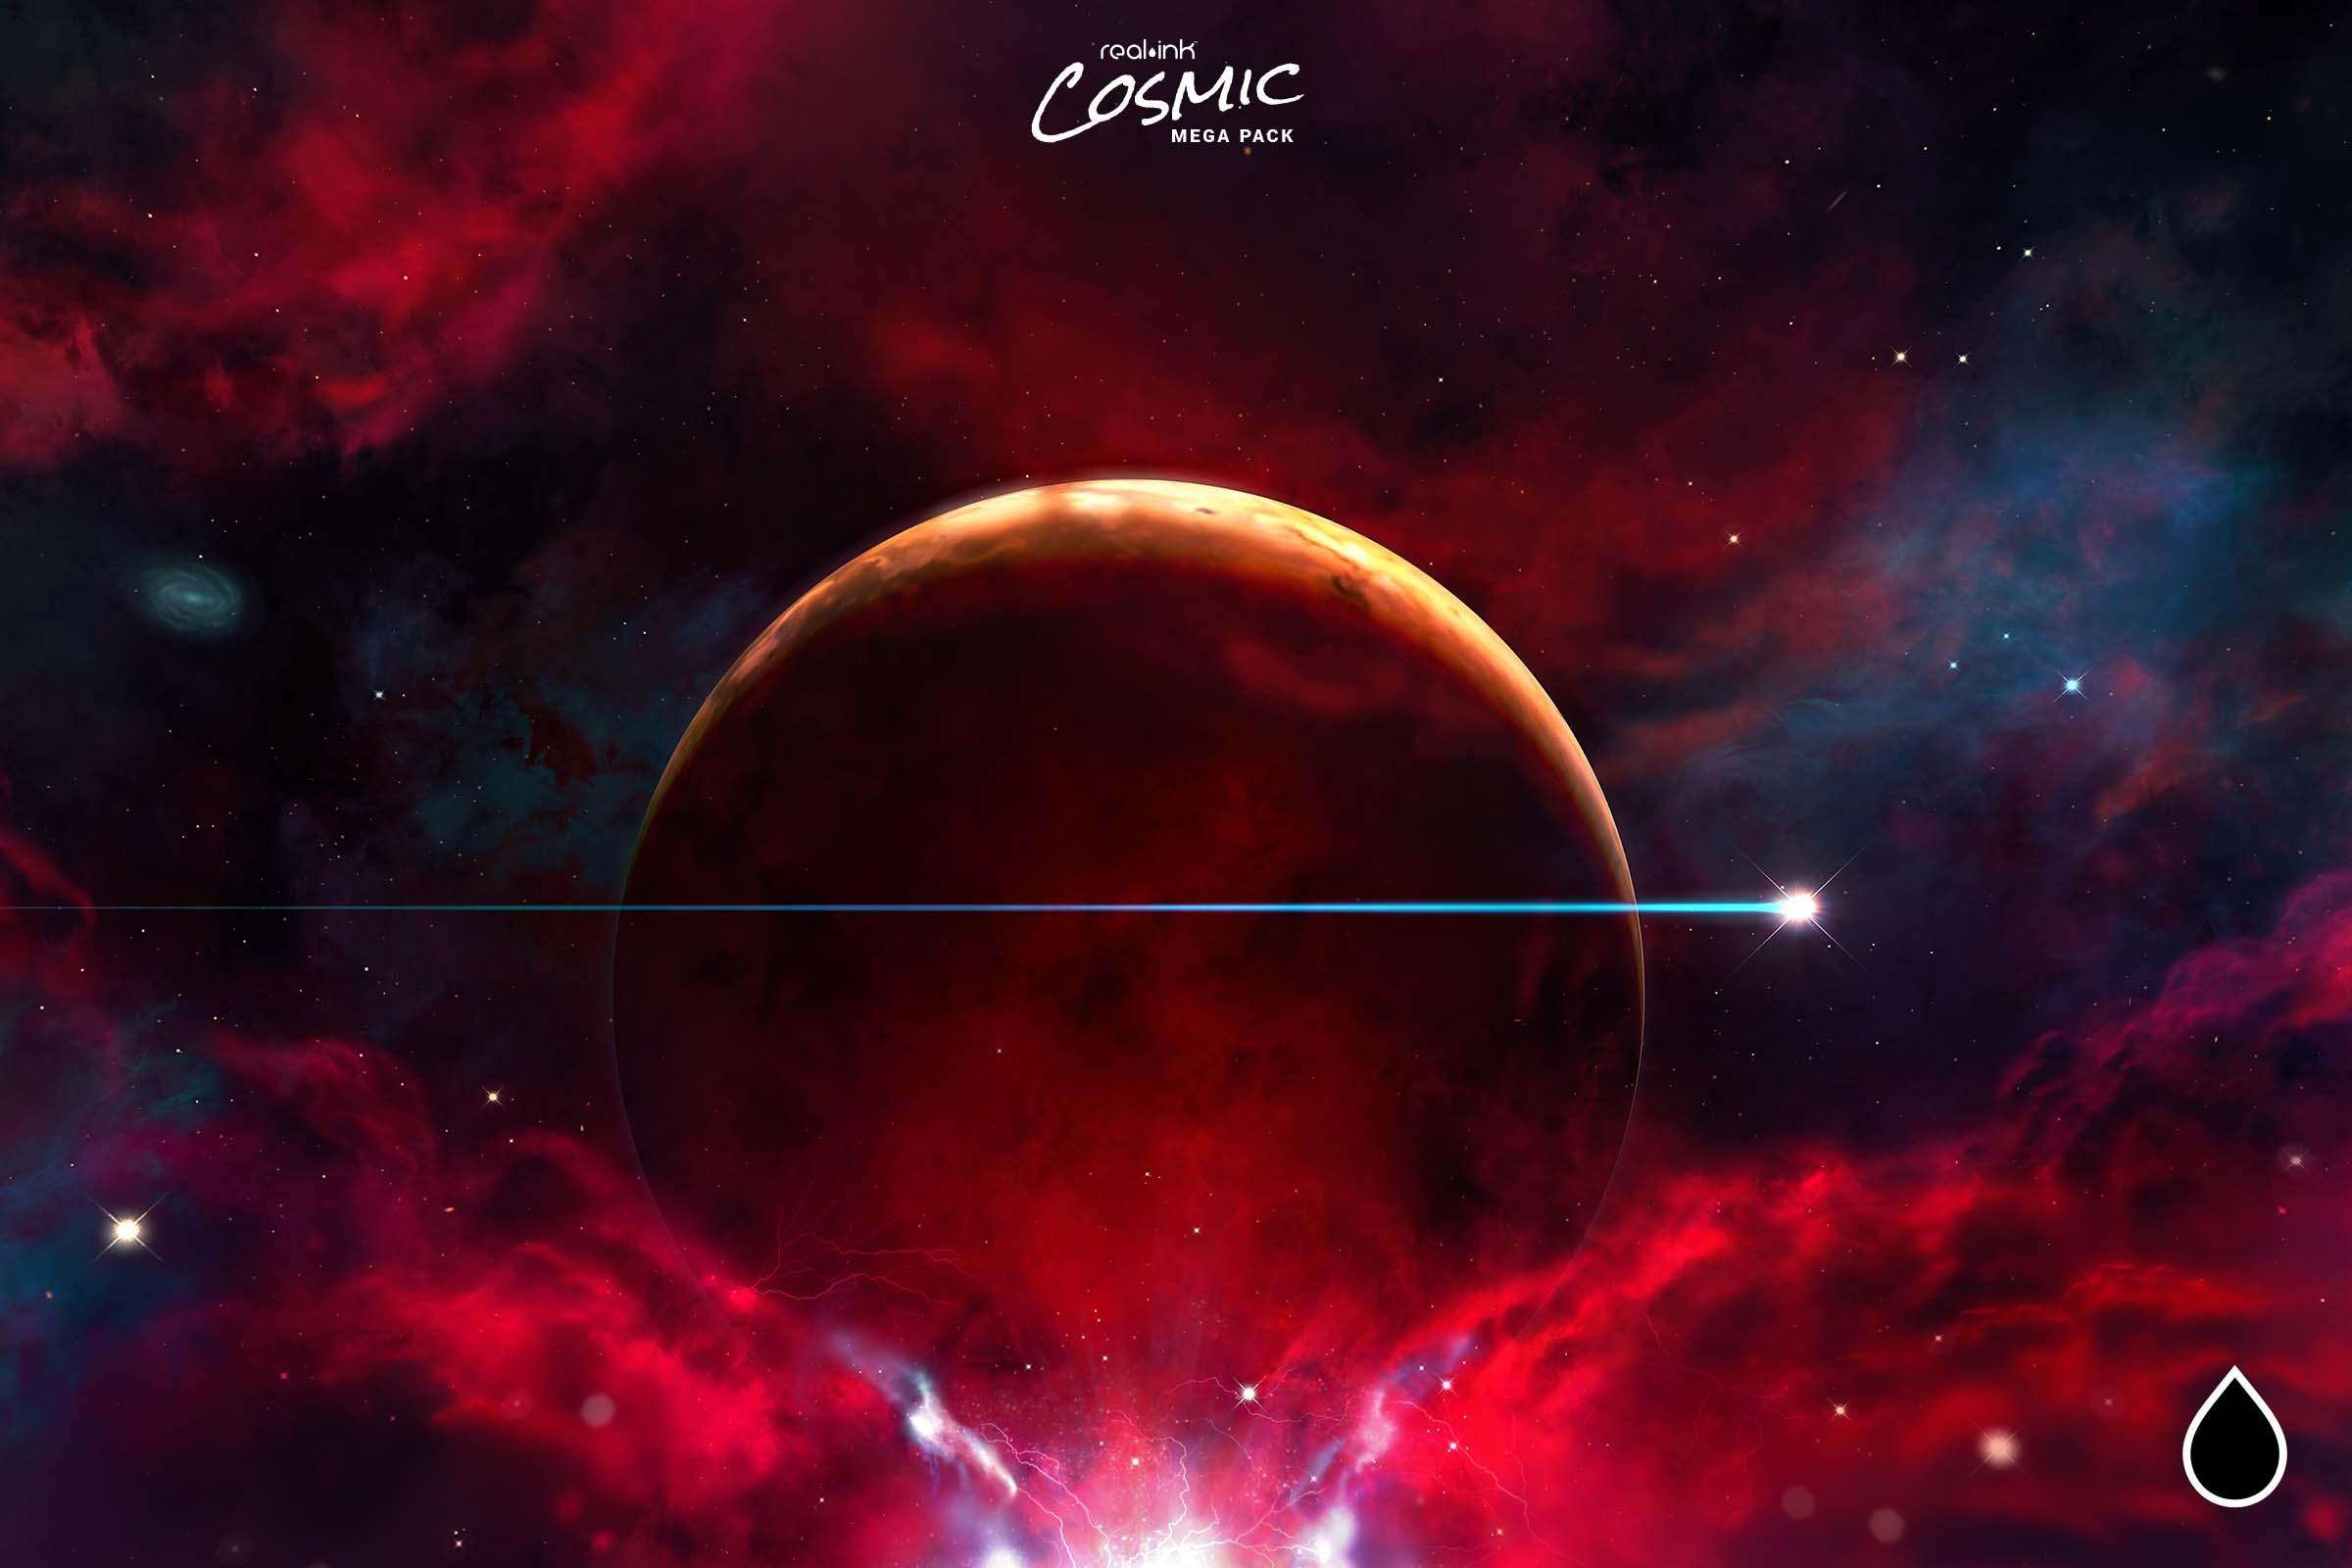 Cosmic Illustration